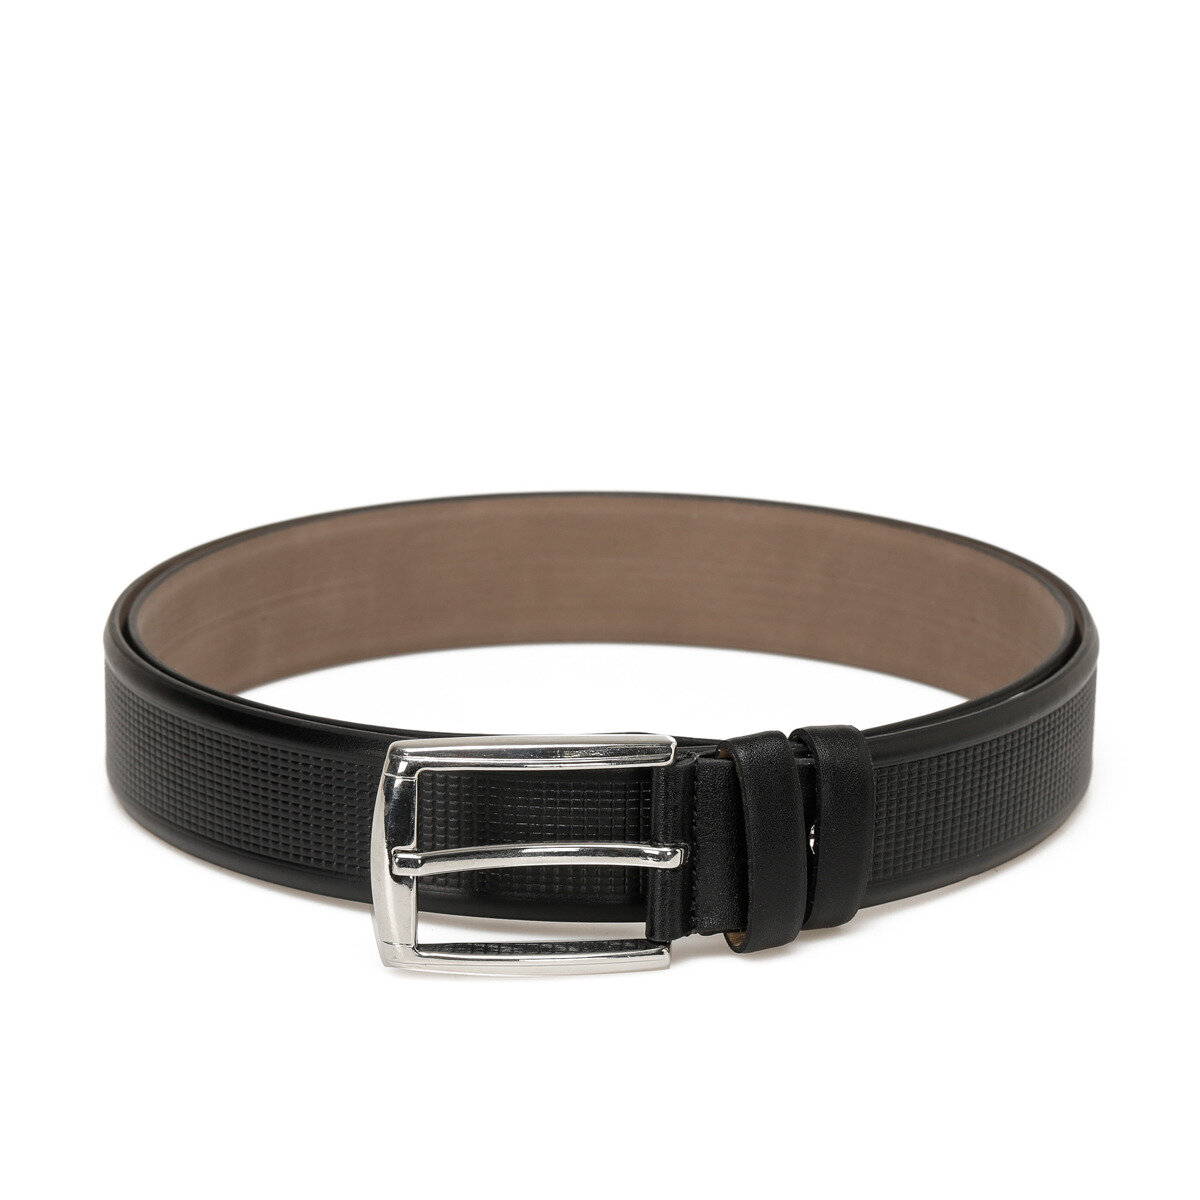 FLO 20M VZY BSKI KMR Black Male Belt Garamond